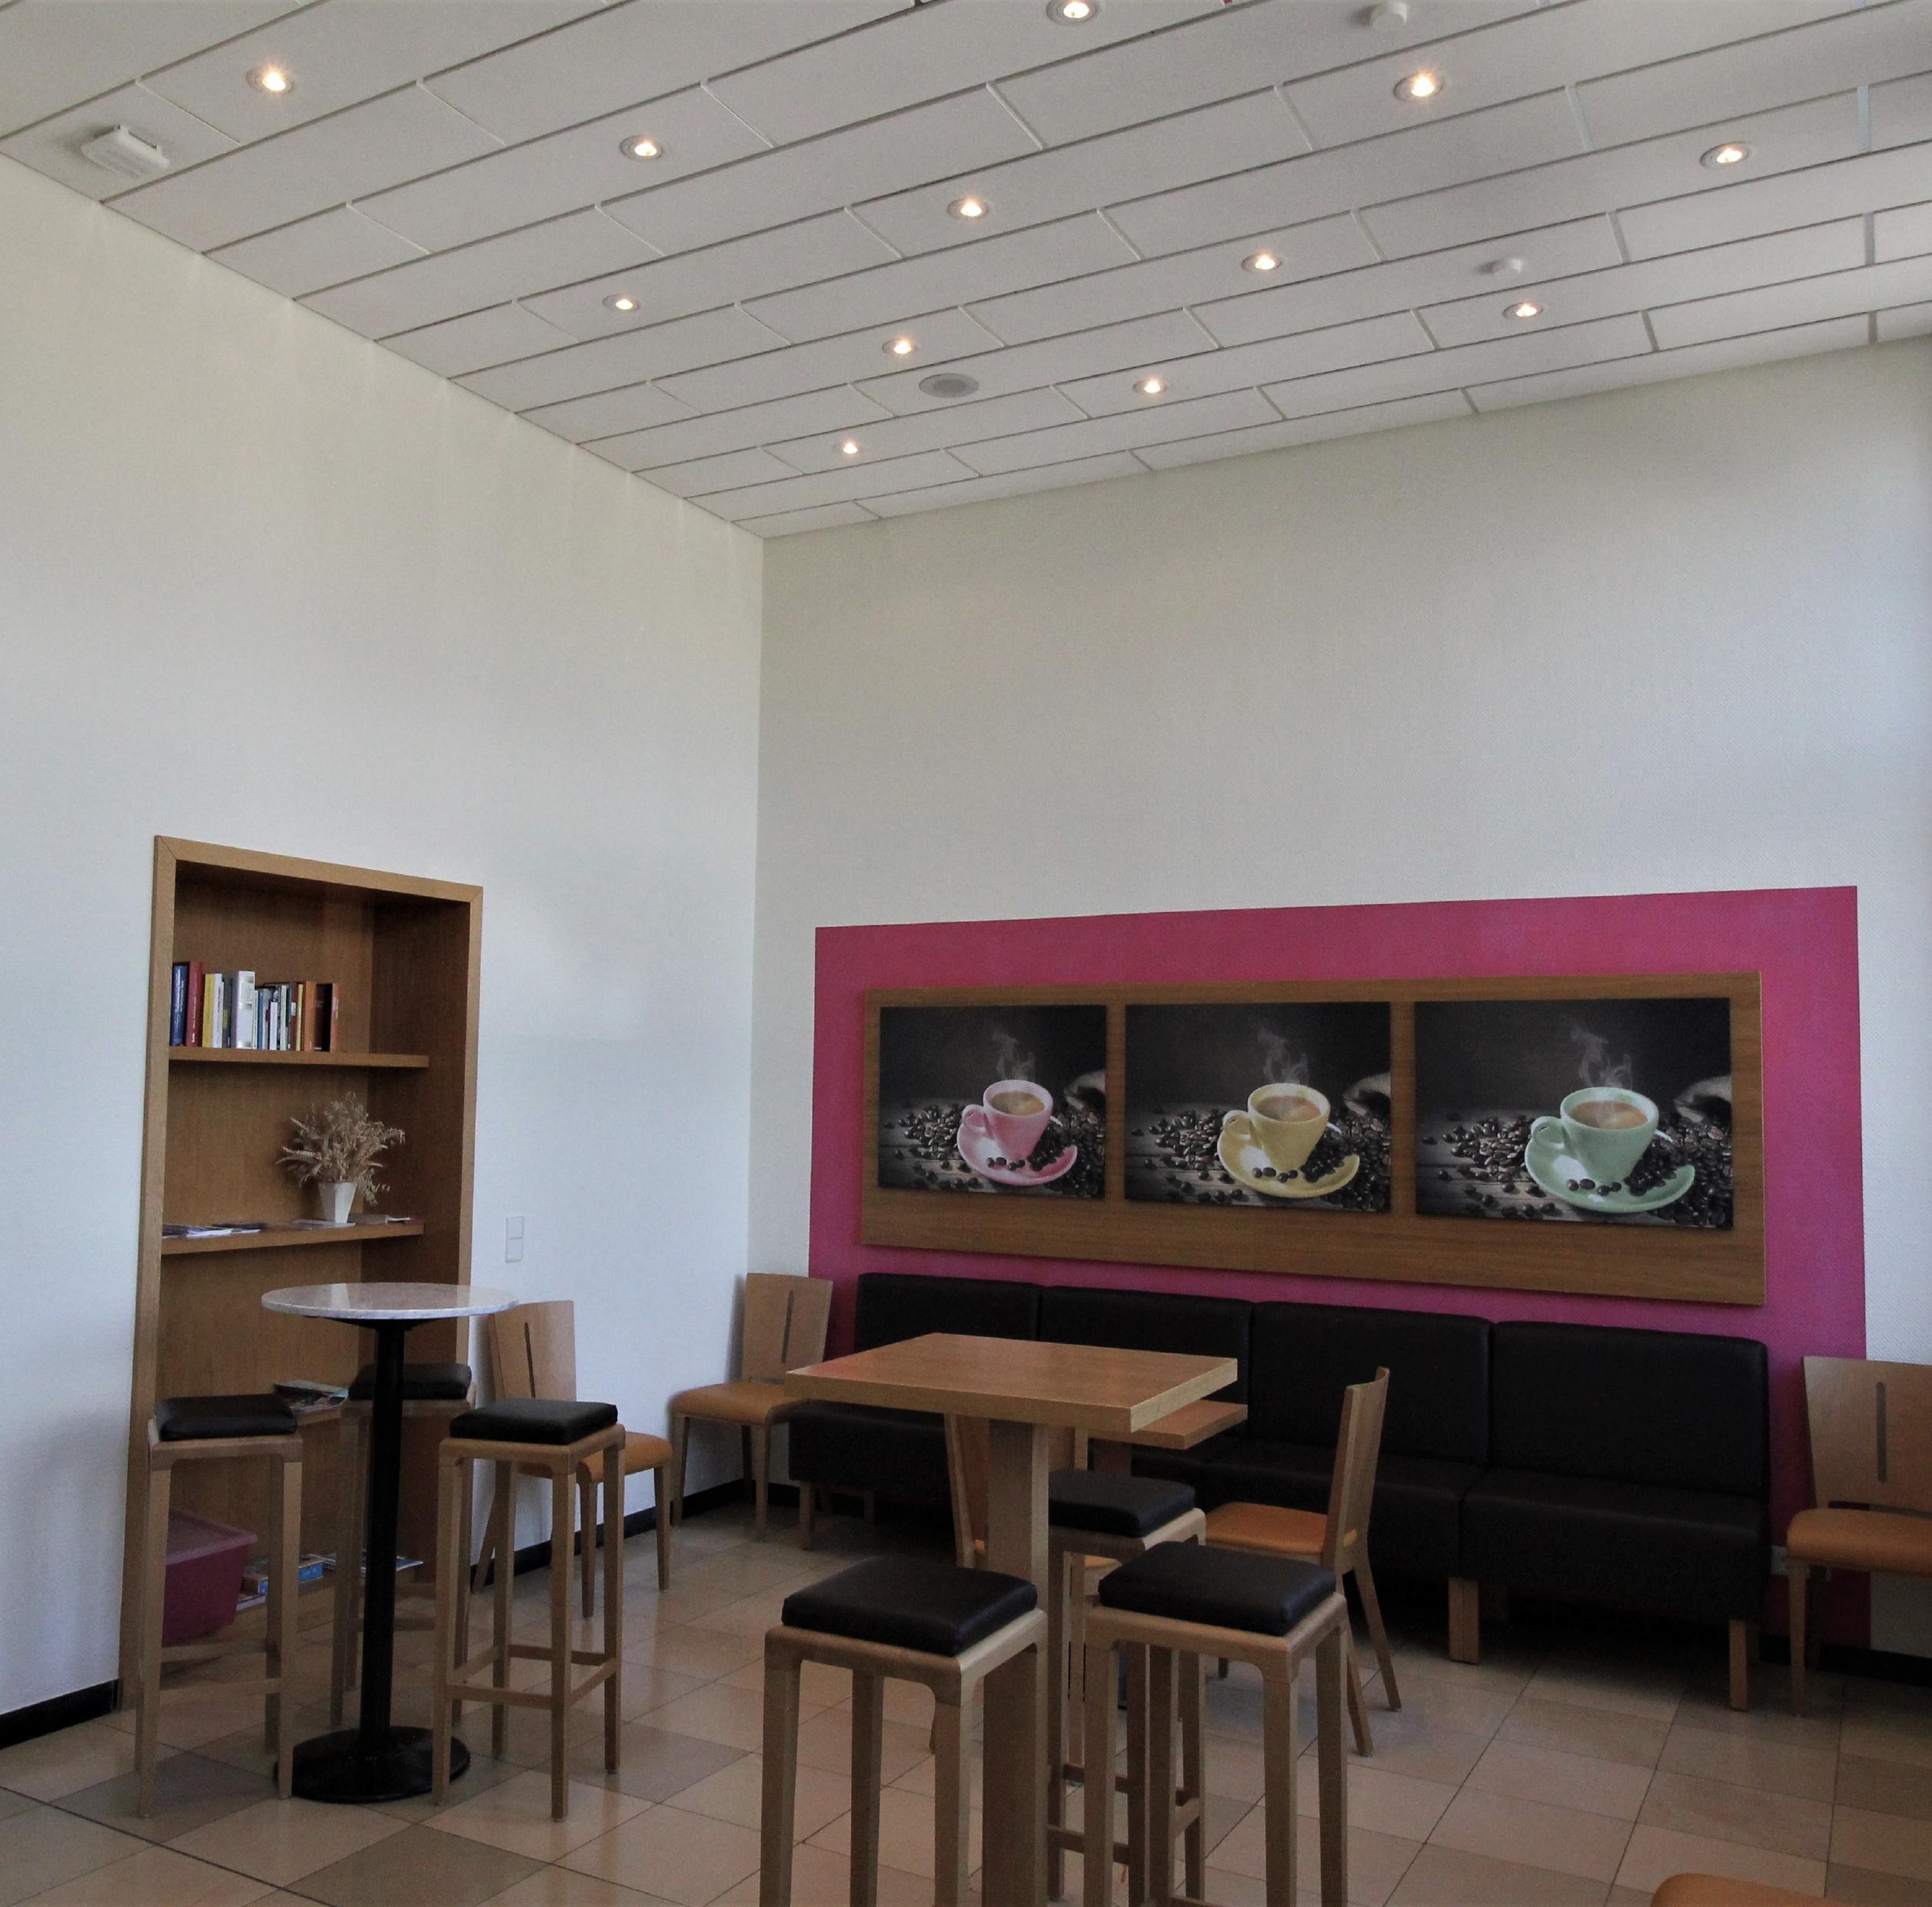 06 Cafeteria